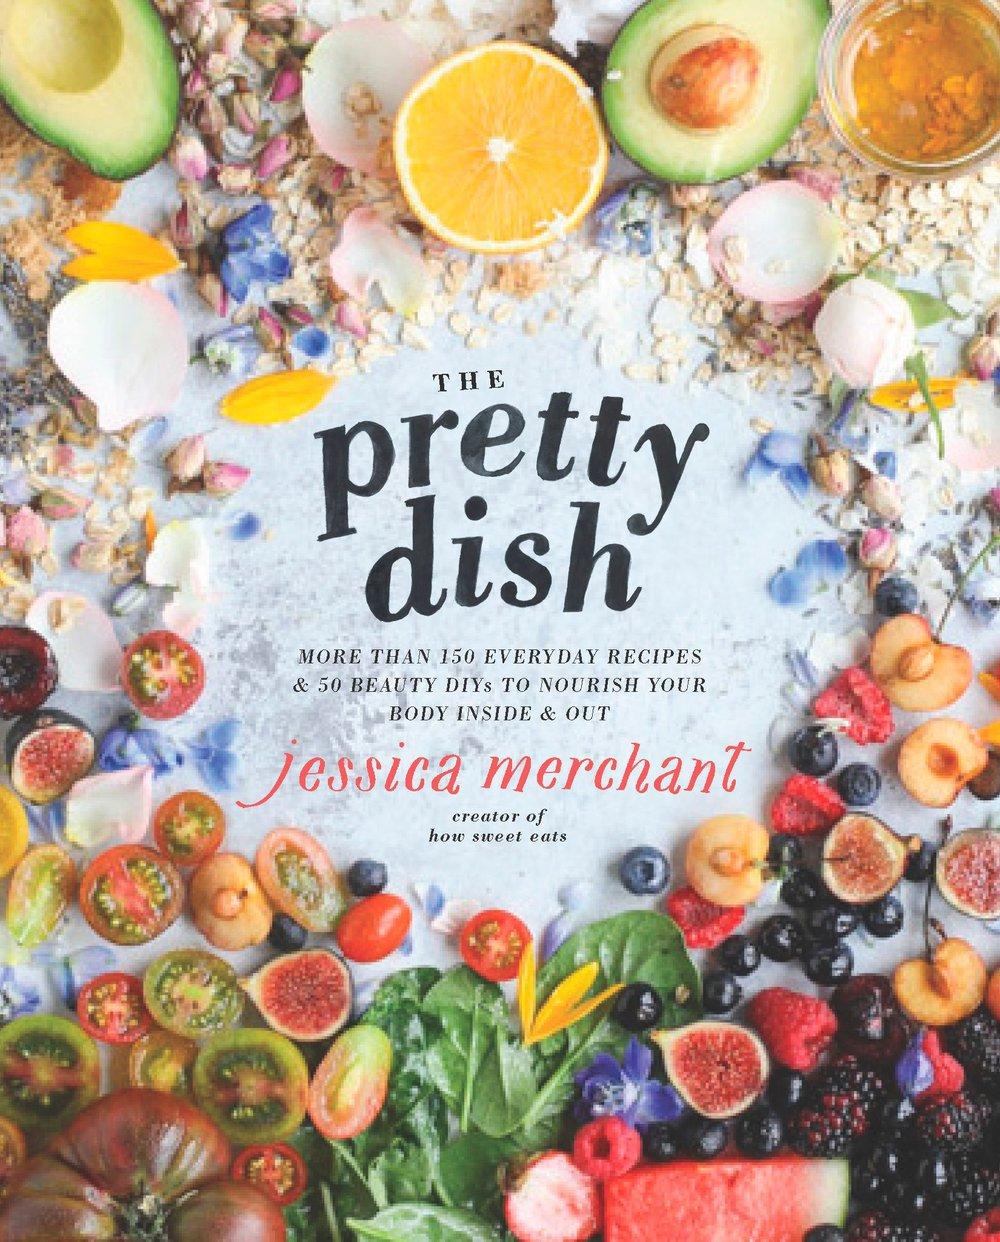 The pretty dish.jpg